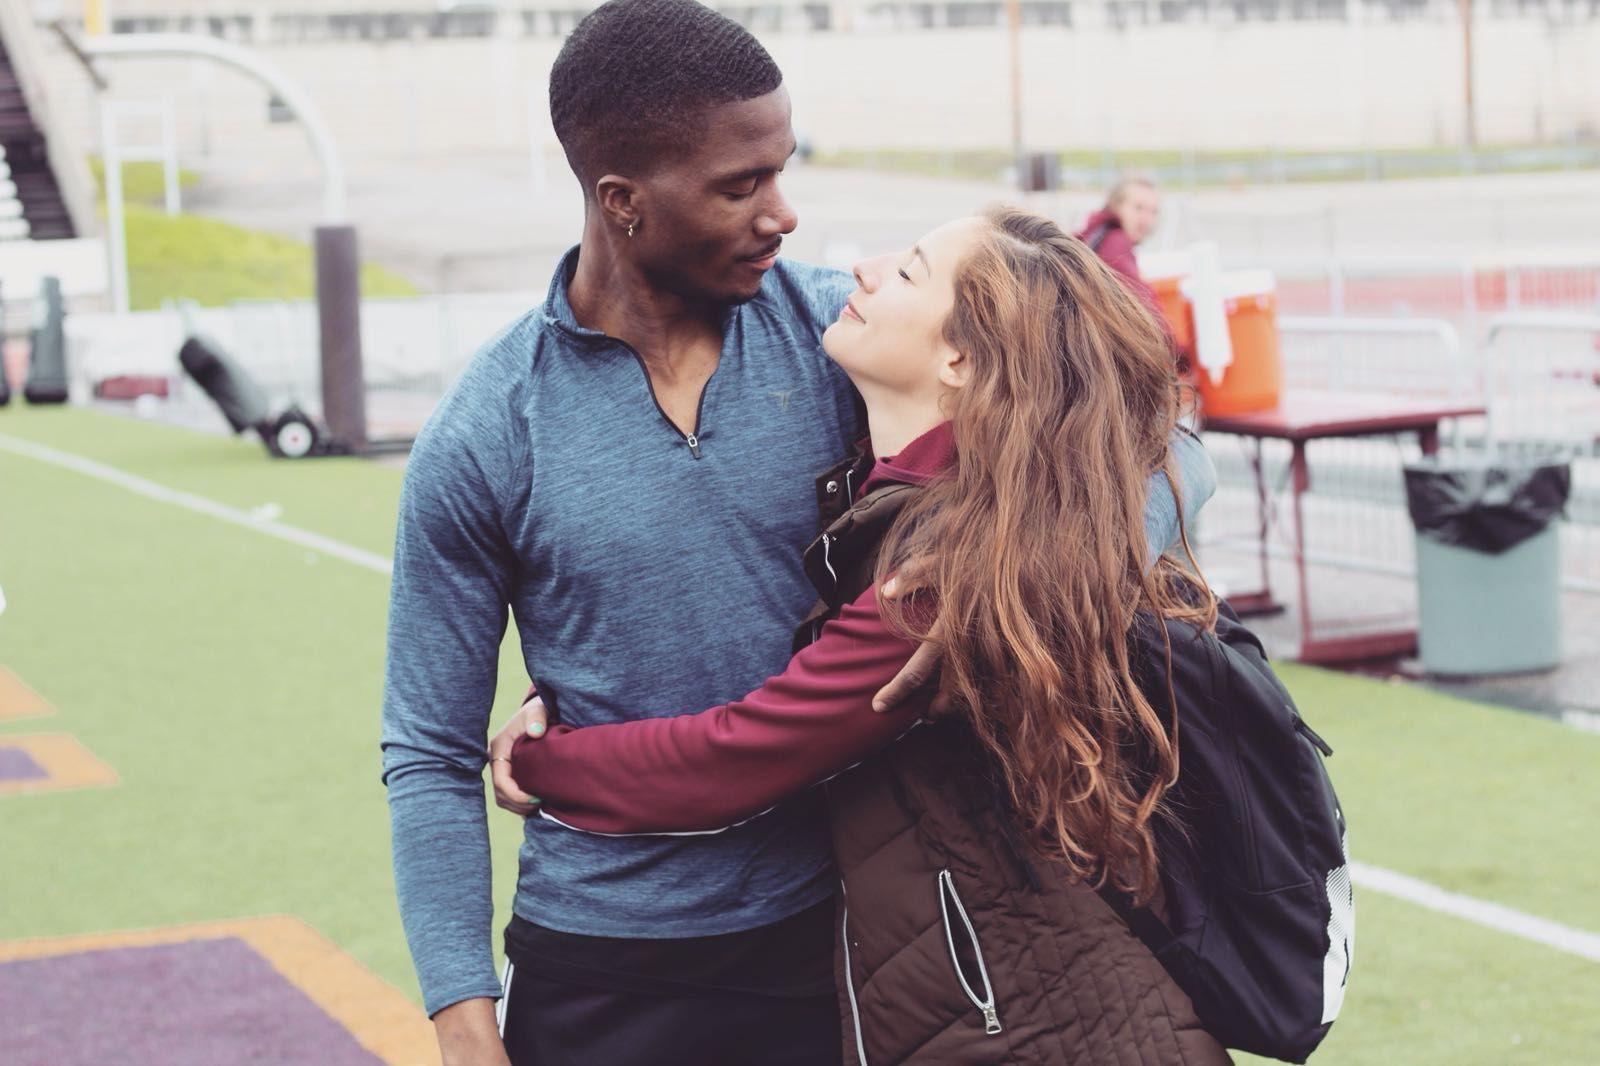 International interracial dating bi dating uk